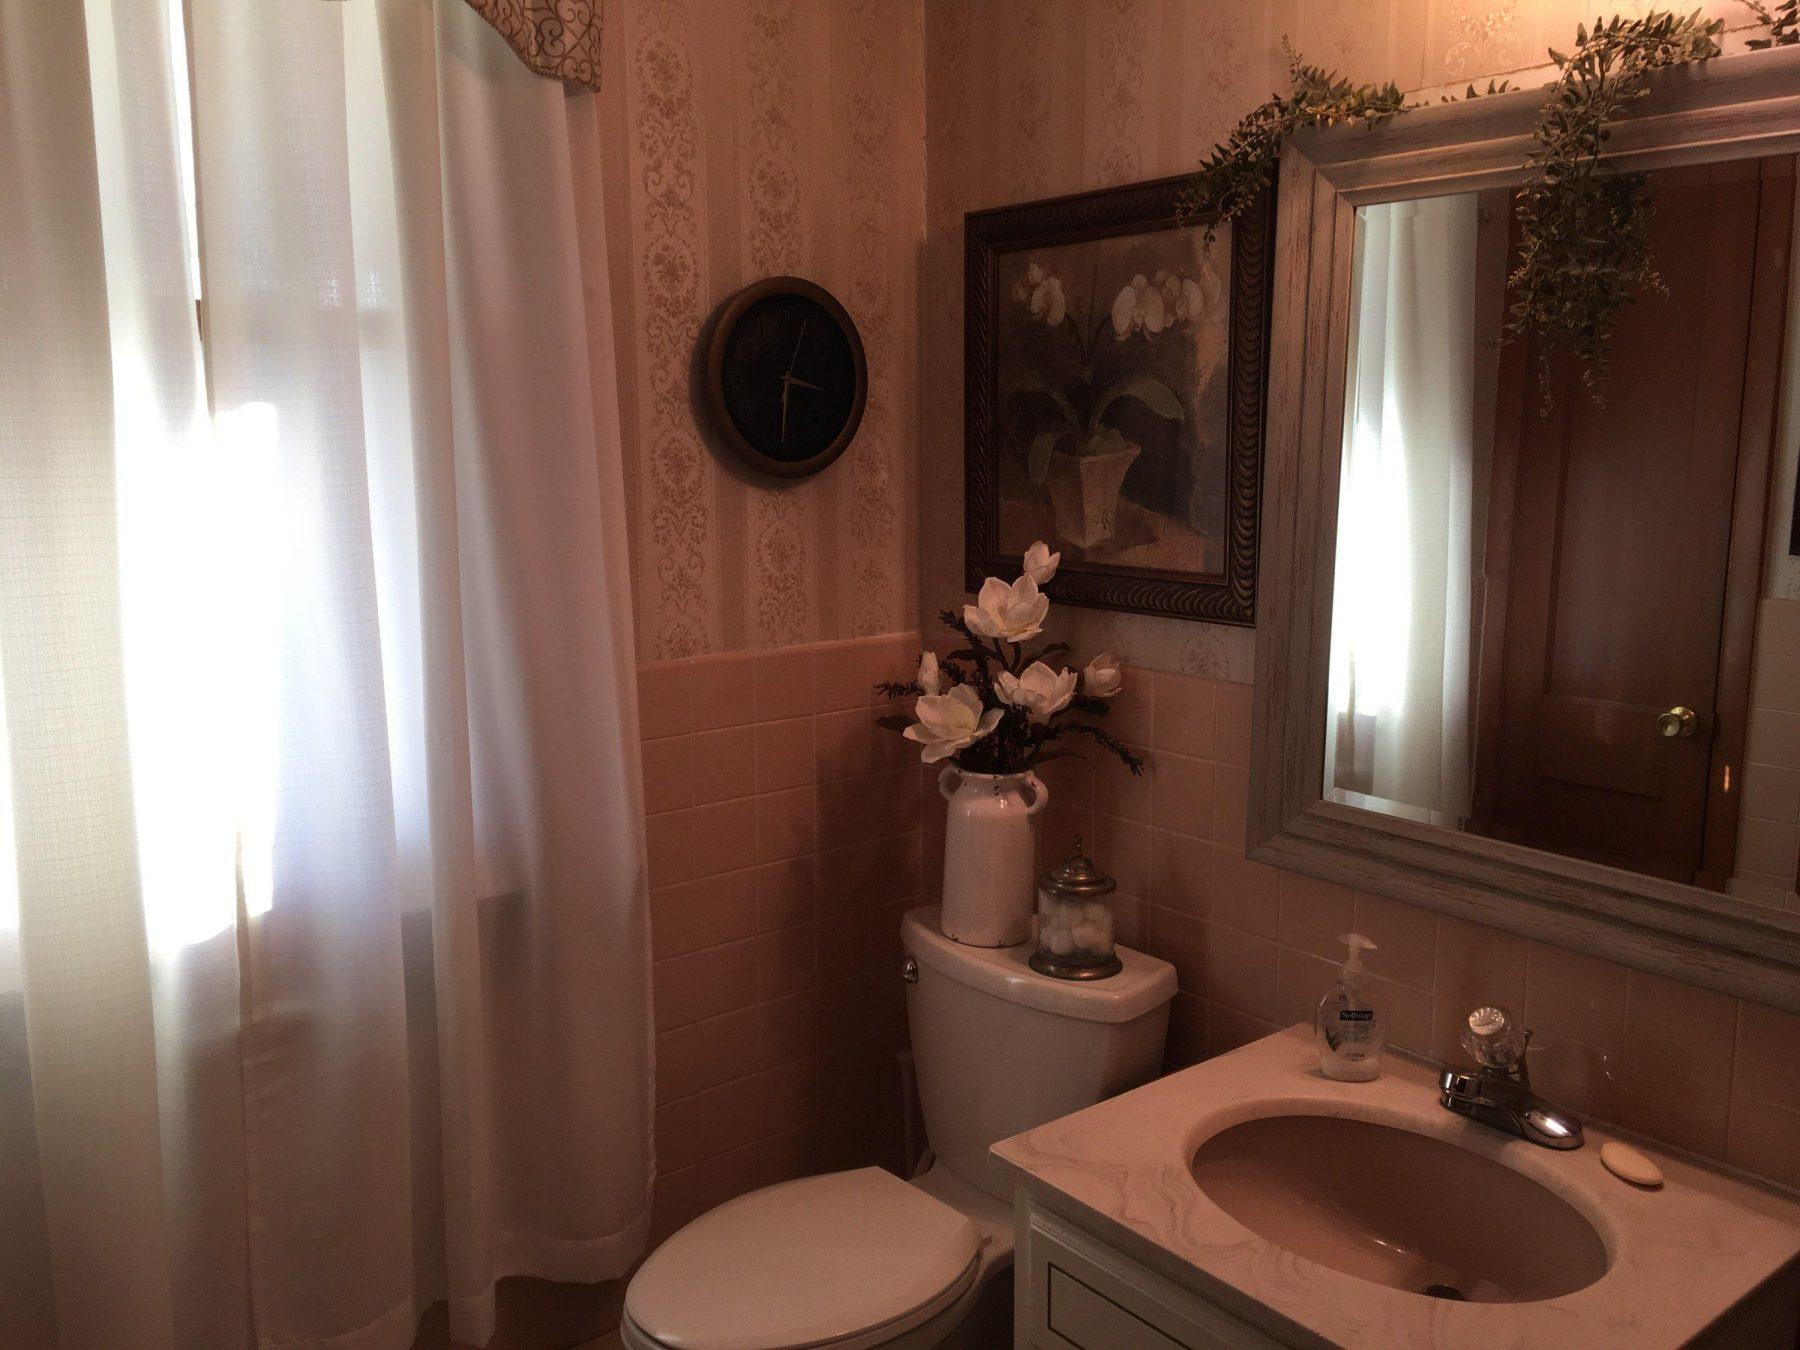 Hembrough Bathroom